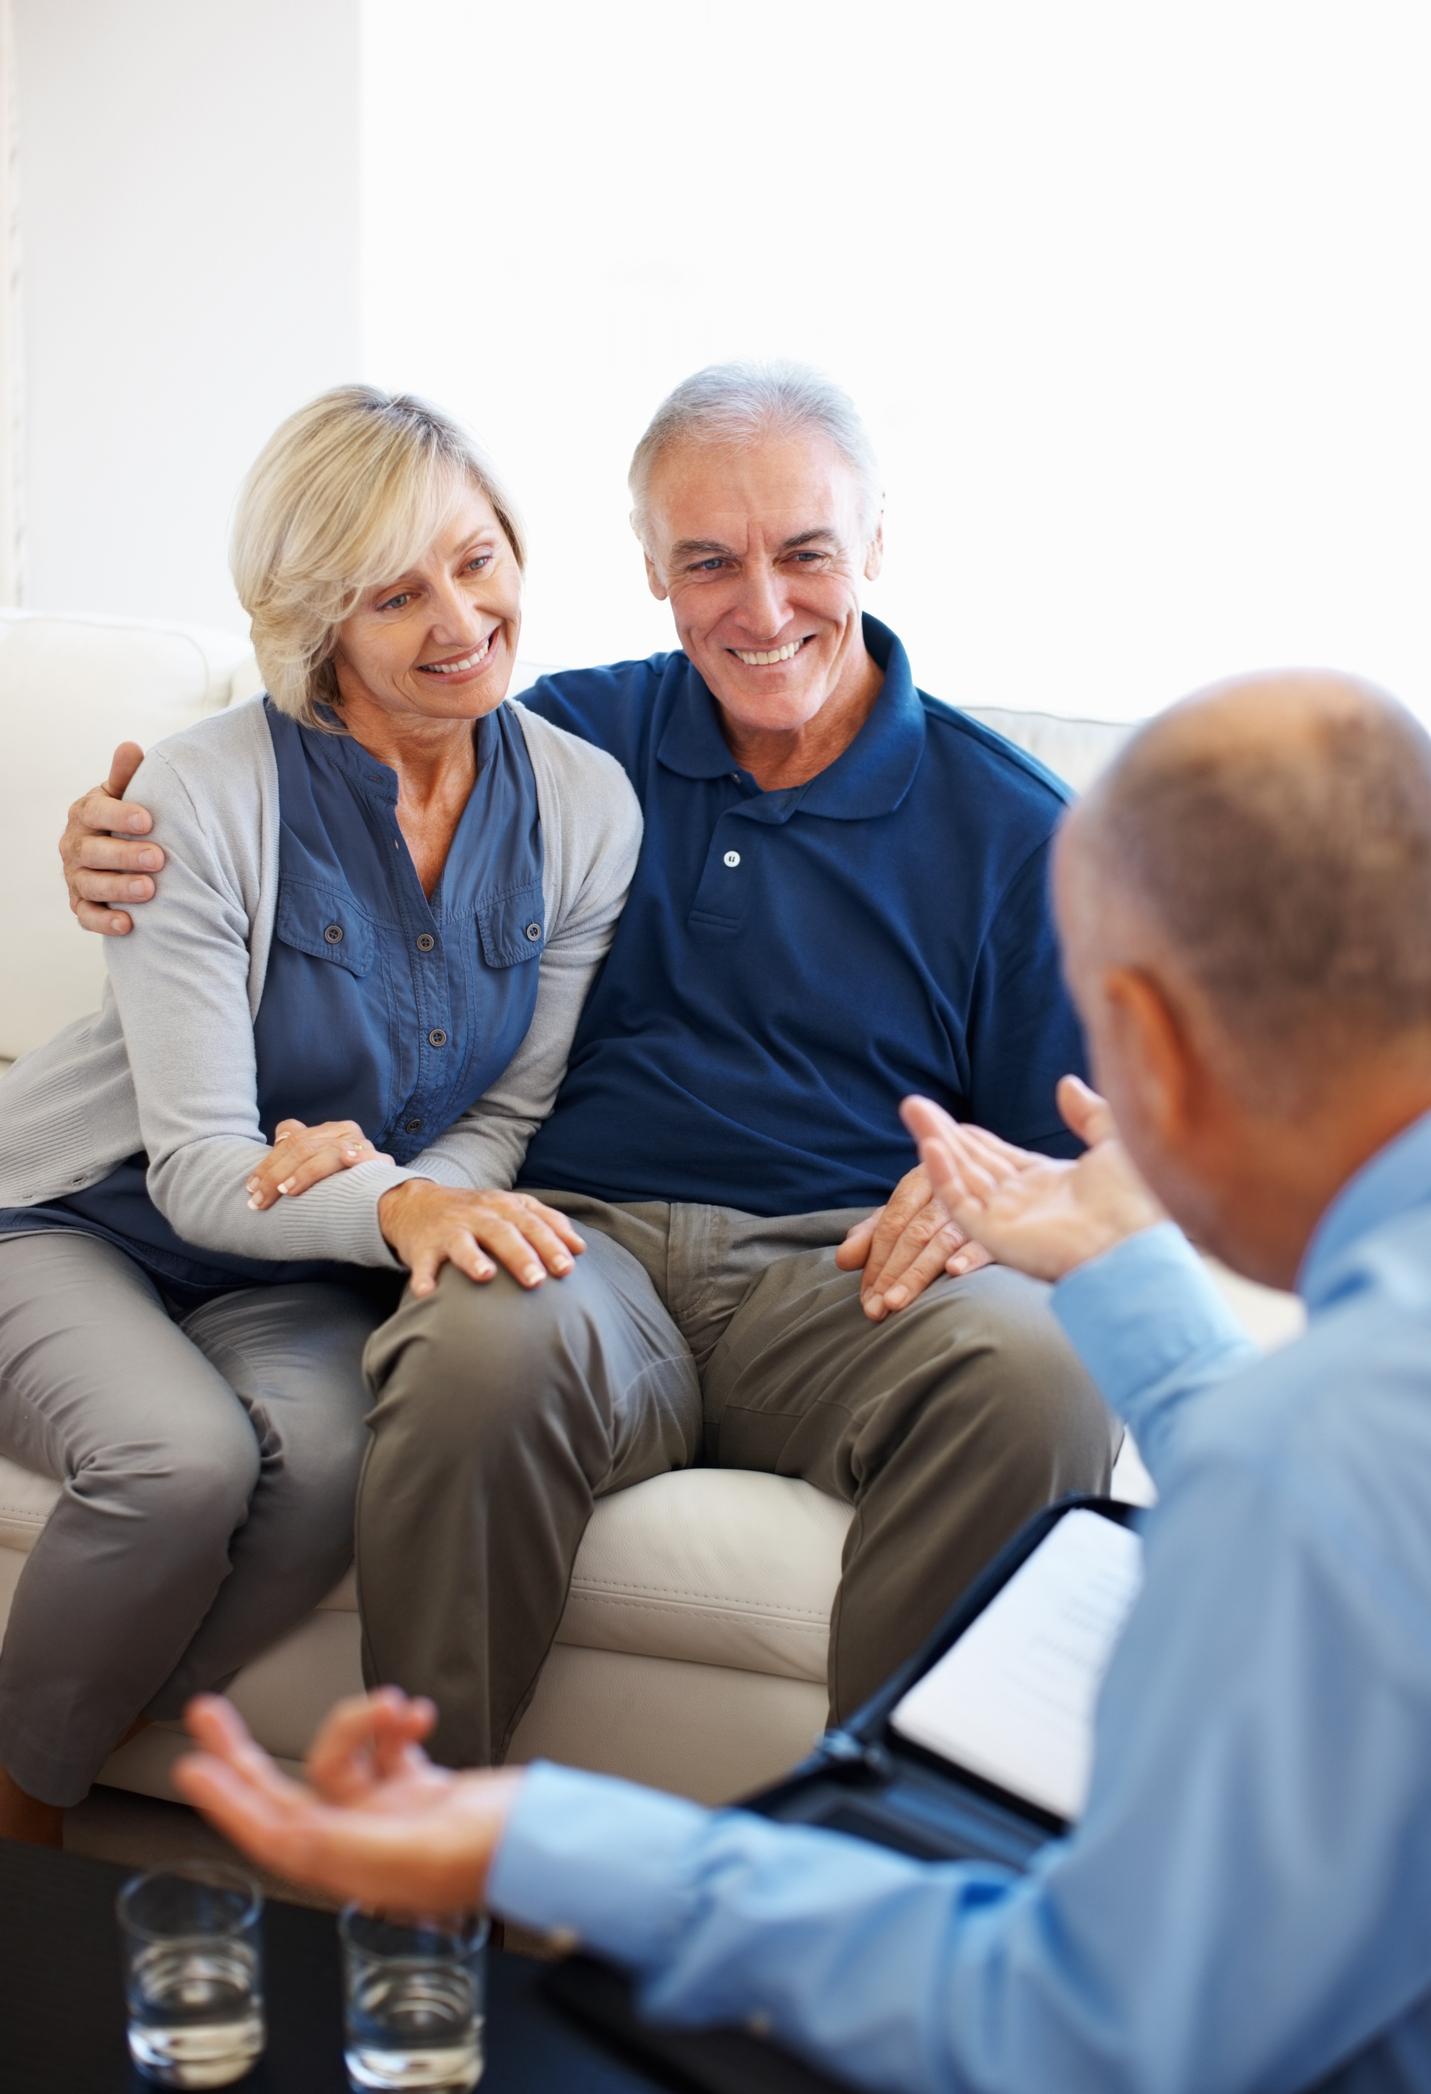 Independent Advisors El Segundo, CA California Retirement Advisors